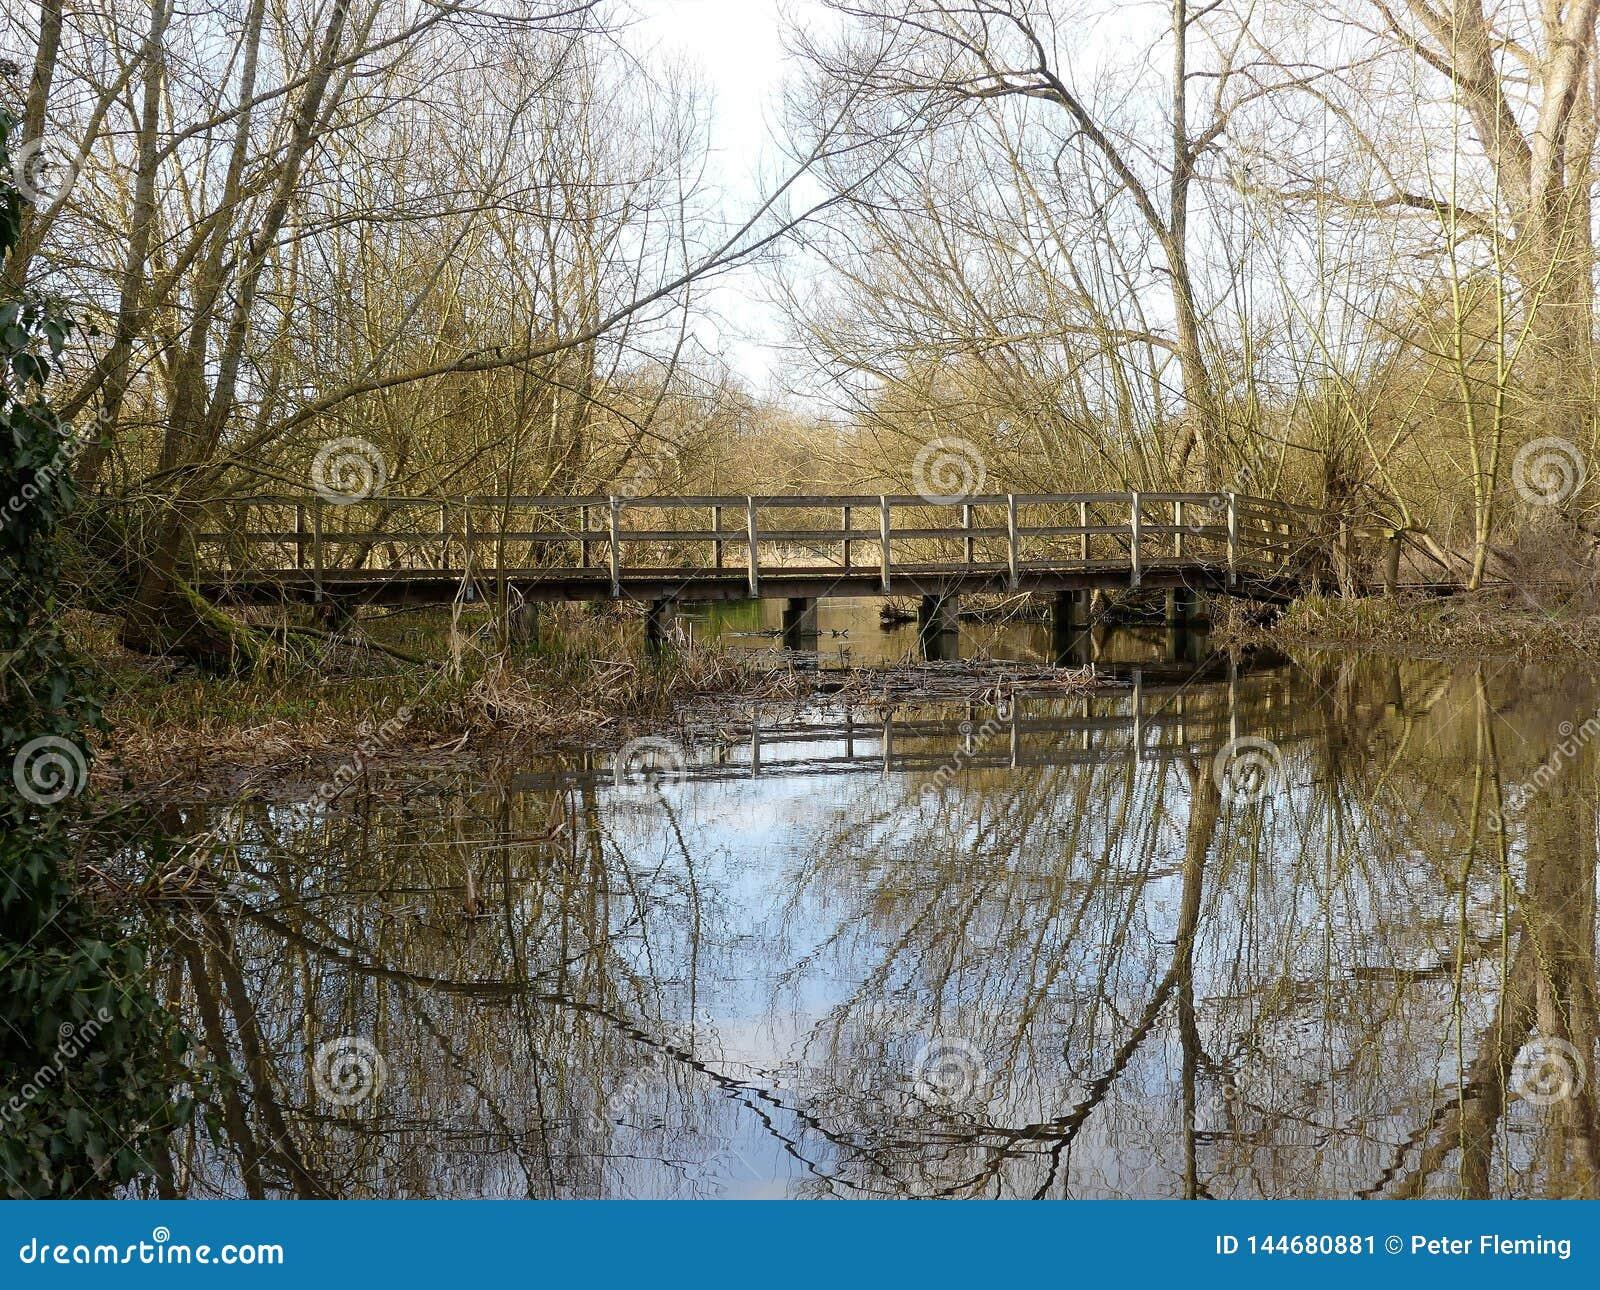 Wooden Bridge over River Chess, Chorleywood